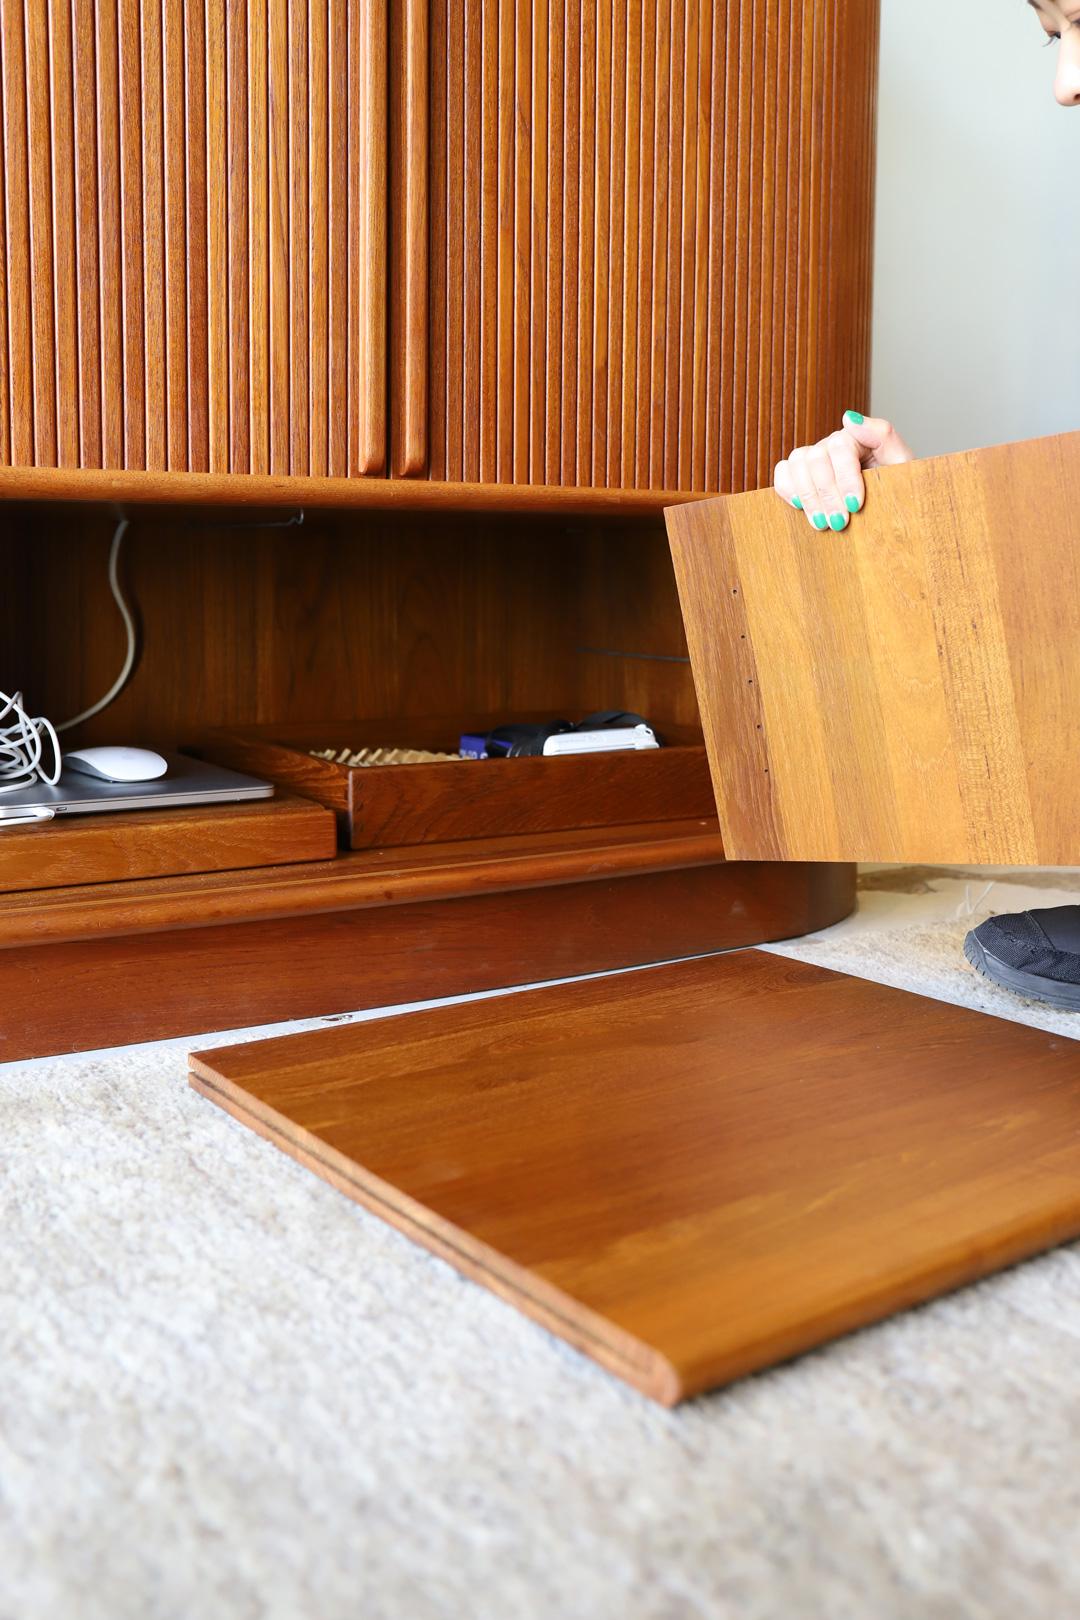 Danish Vintage Dyrlund Bellows Cabinet/デンマーク ヴィンテージ デューロン キャビネット 蛇腹 チーク材 テレビボード ミッドセンチュリー モダン